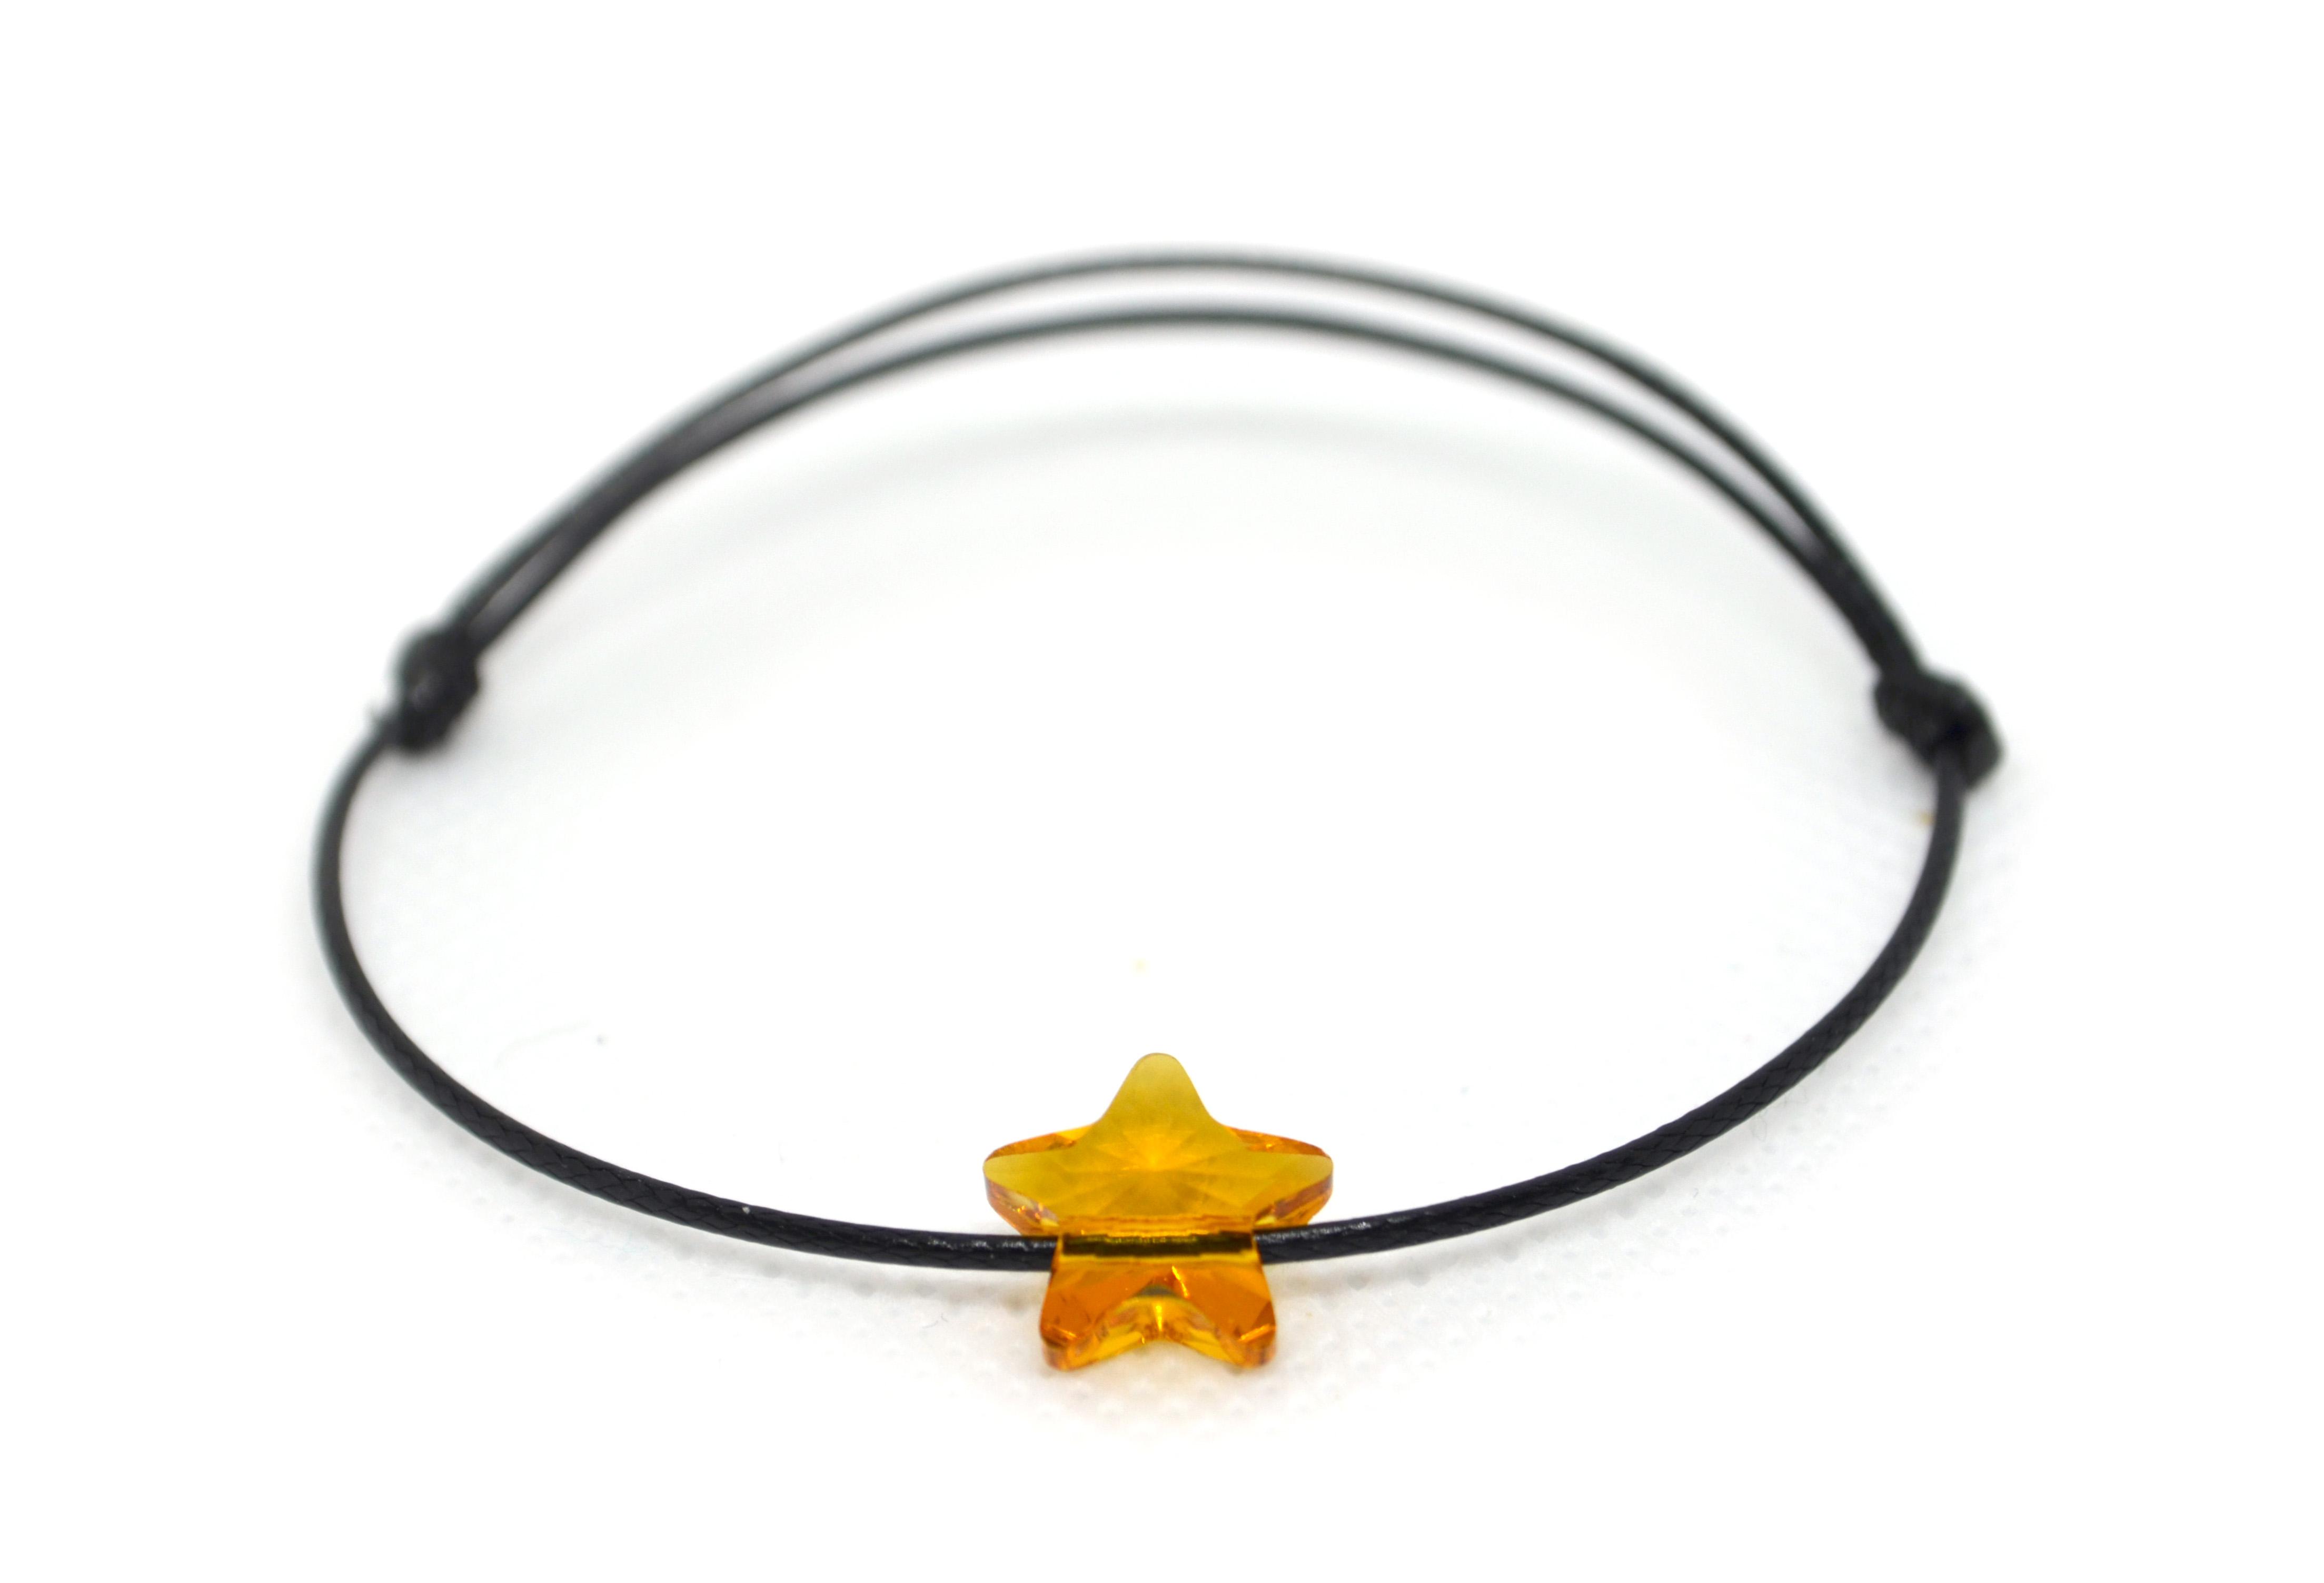 Šňůkový náramek oranžová hvězdička SWAROVSKI Černá šňůrka, Pánský náramek